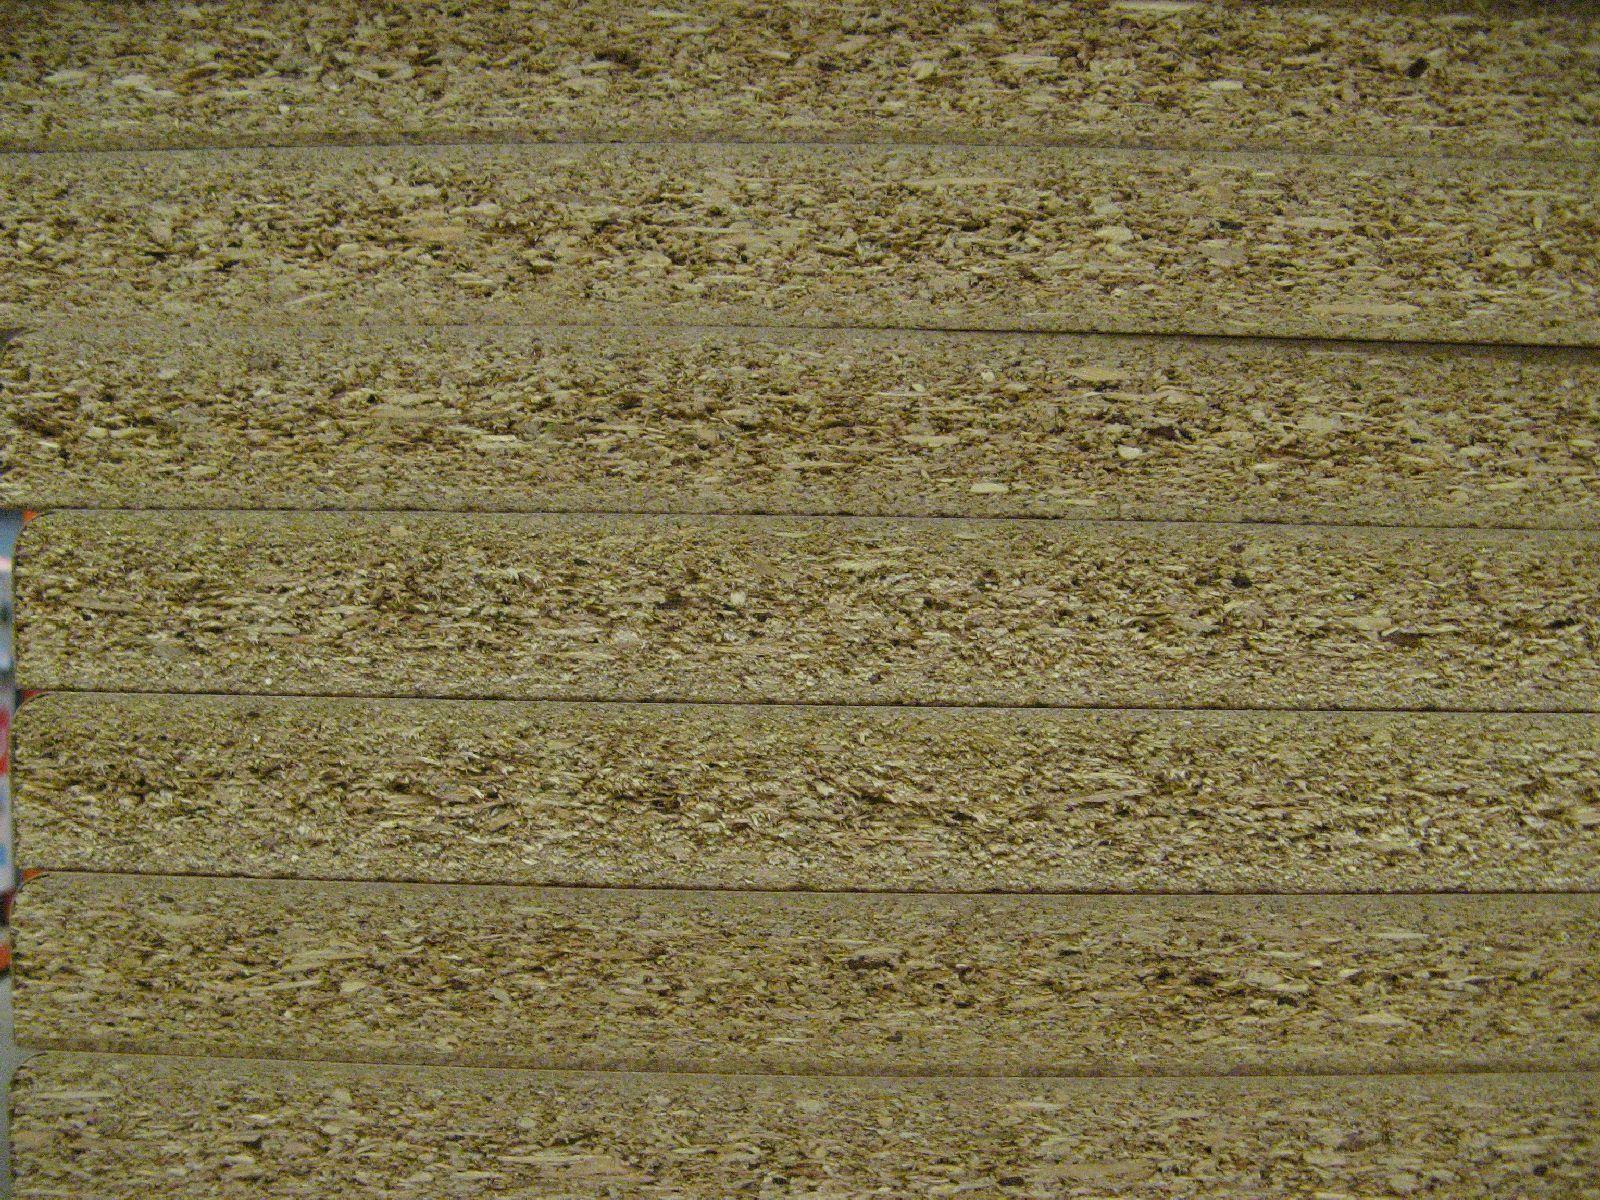 Wood_Textures_B_4743